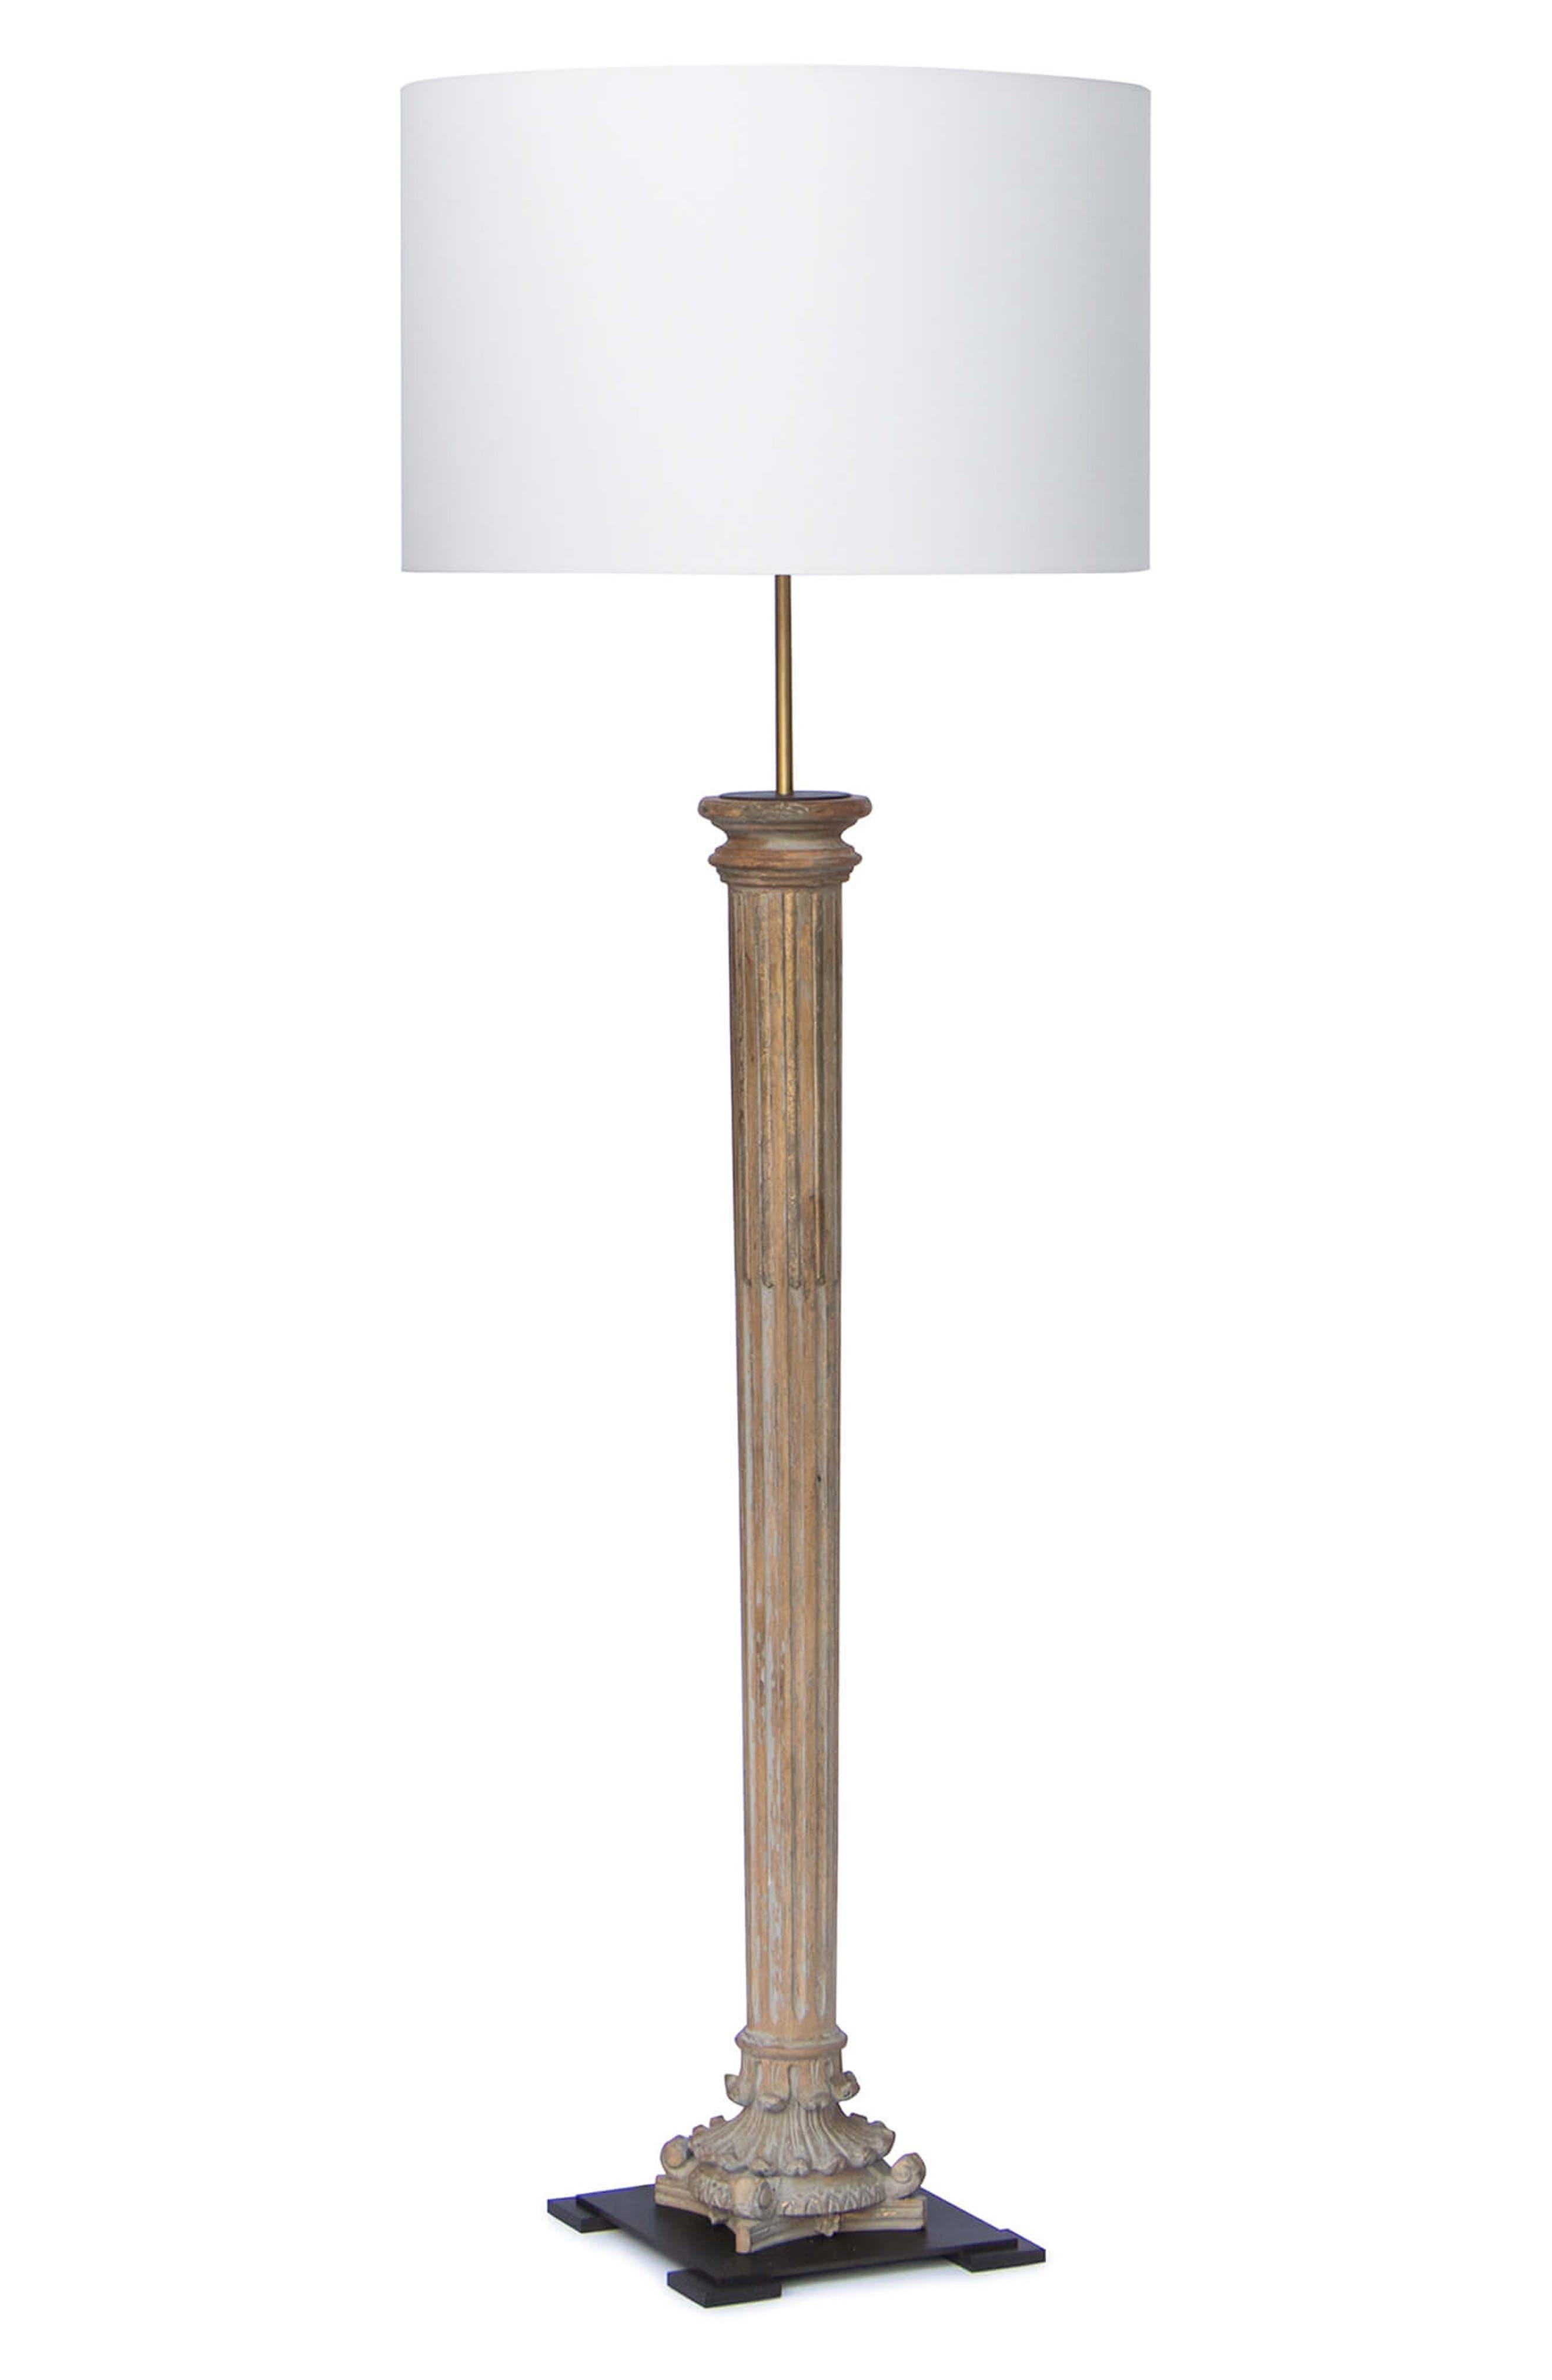 Design Reuben Floor Lamp, Main, color, NATURAL BRASS